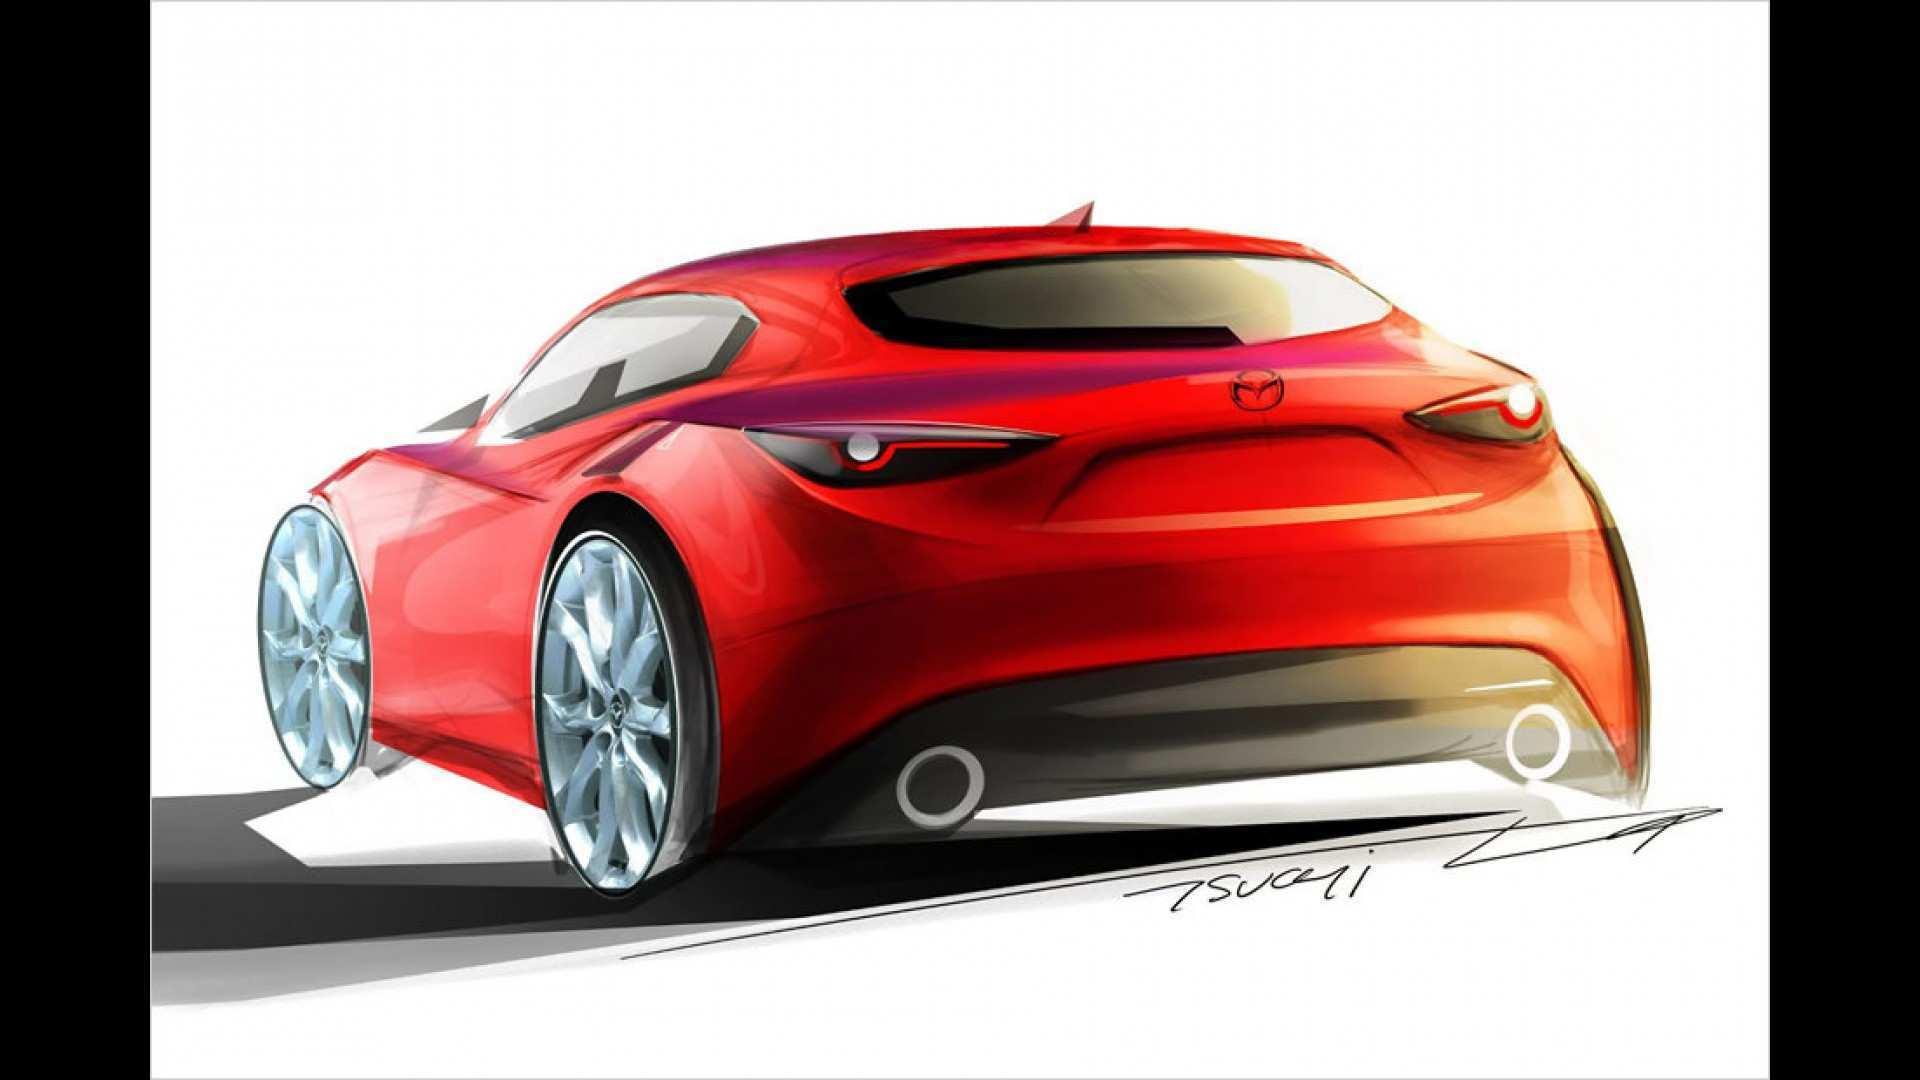 35 Best Review Mazda Zukunft Bis 2020 Prices with Mazda Zukunft Bis 2020